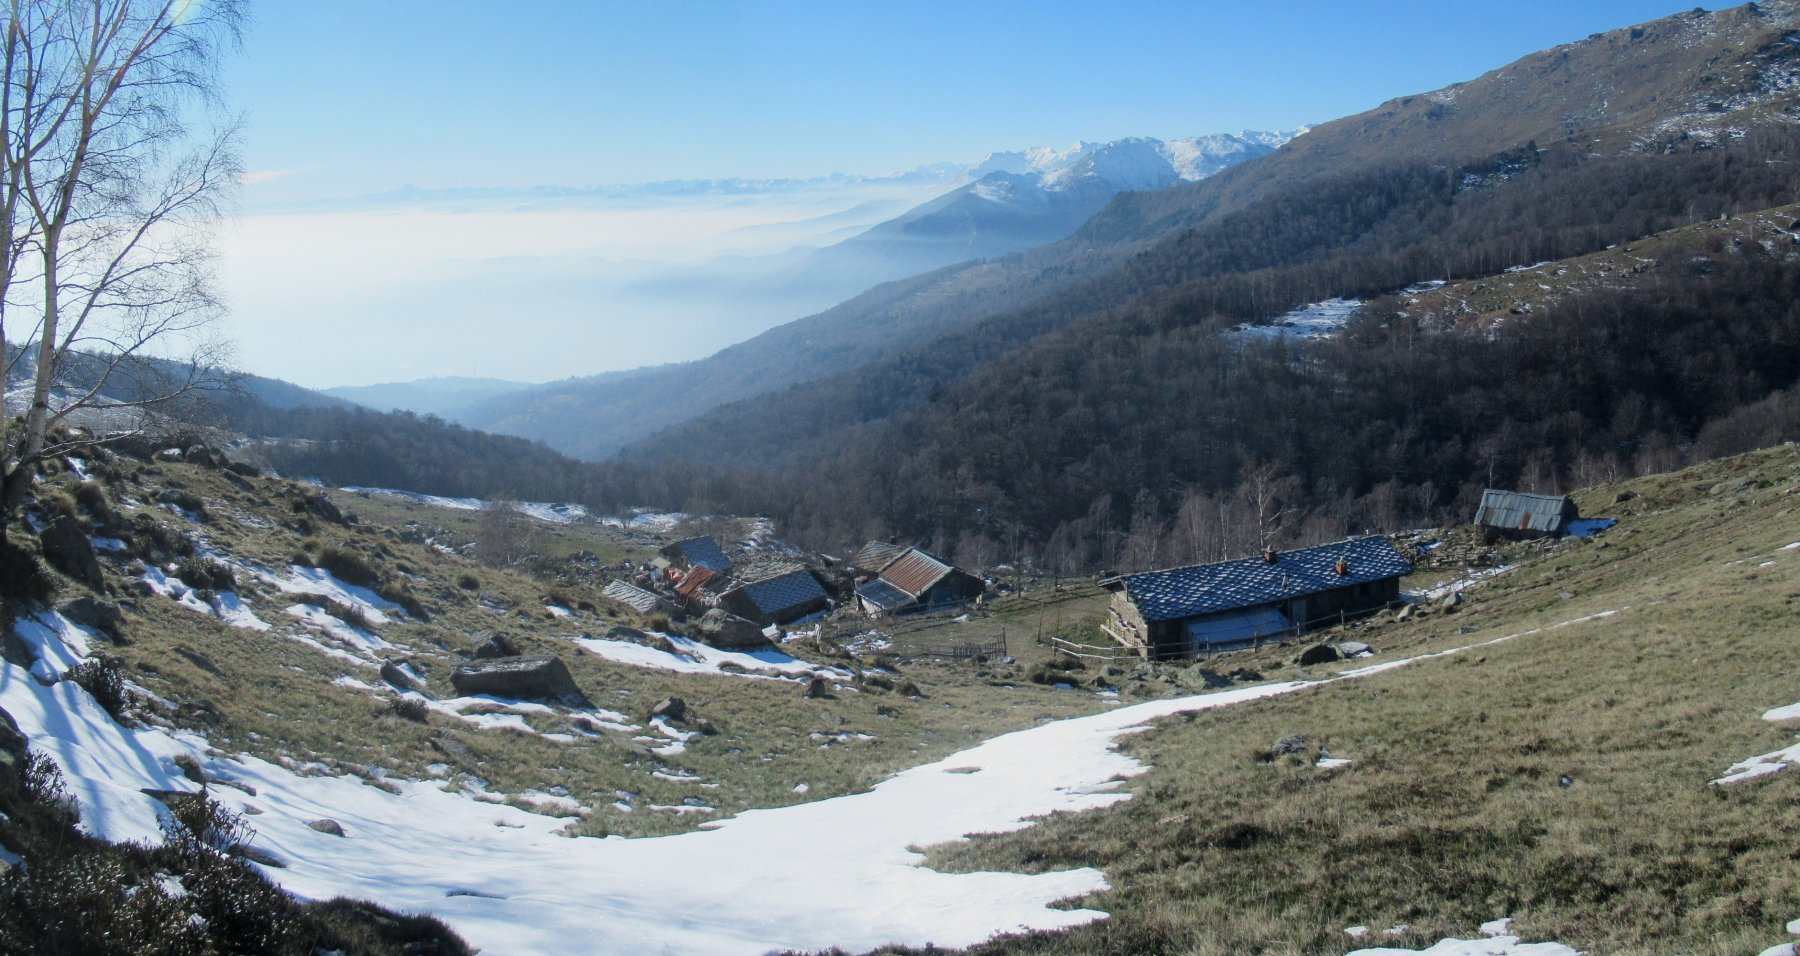 Rifugio Alpe Cavanna